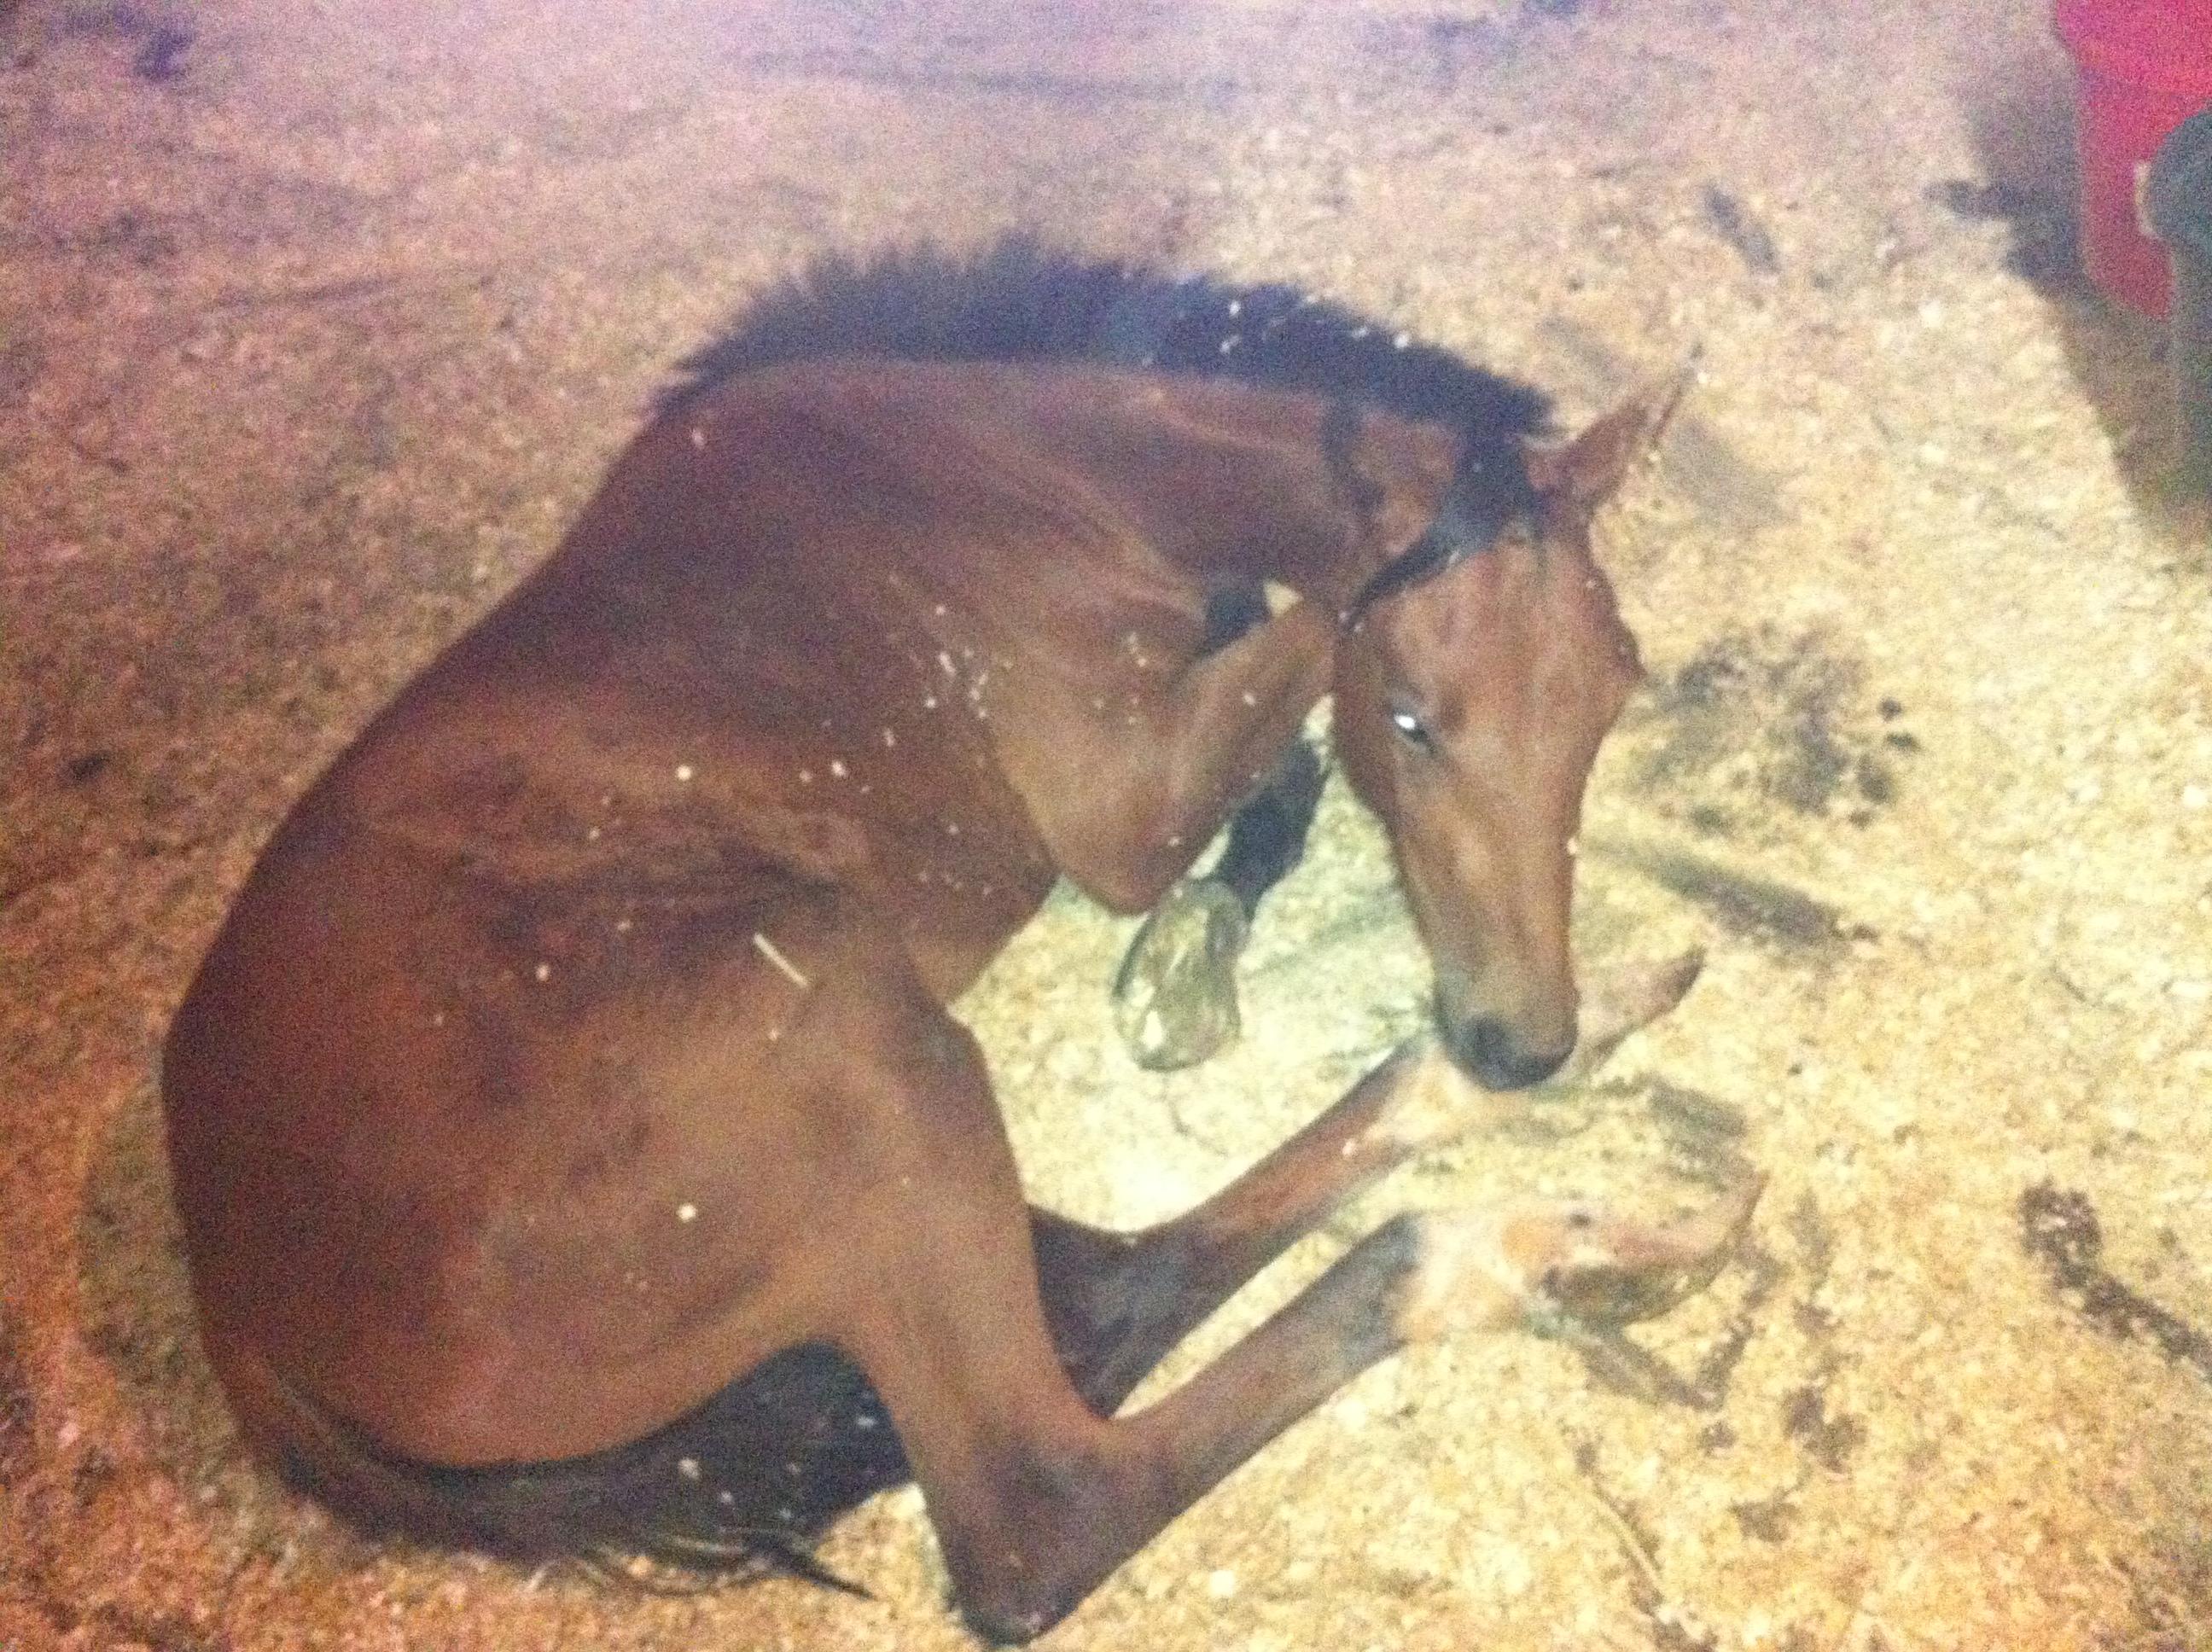 PHOTOS: Gay-run Ranch Hand Rescue receives 6 beaten and neglected horses